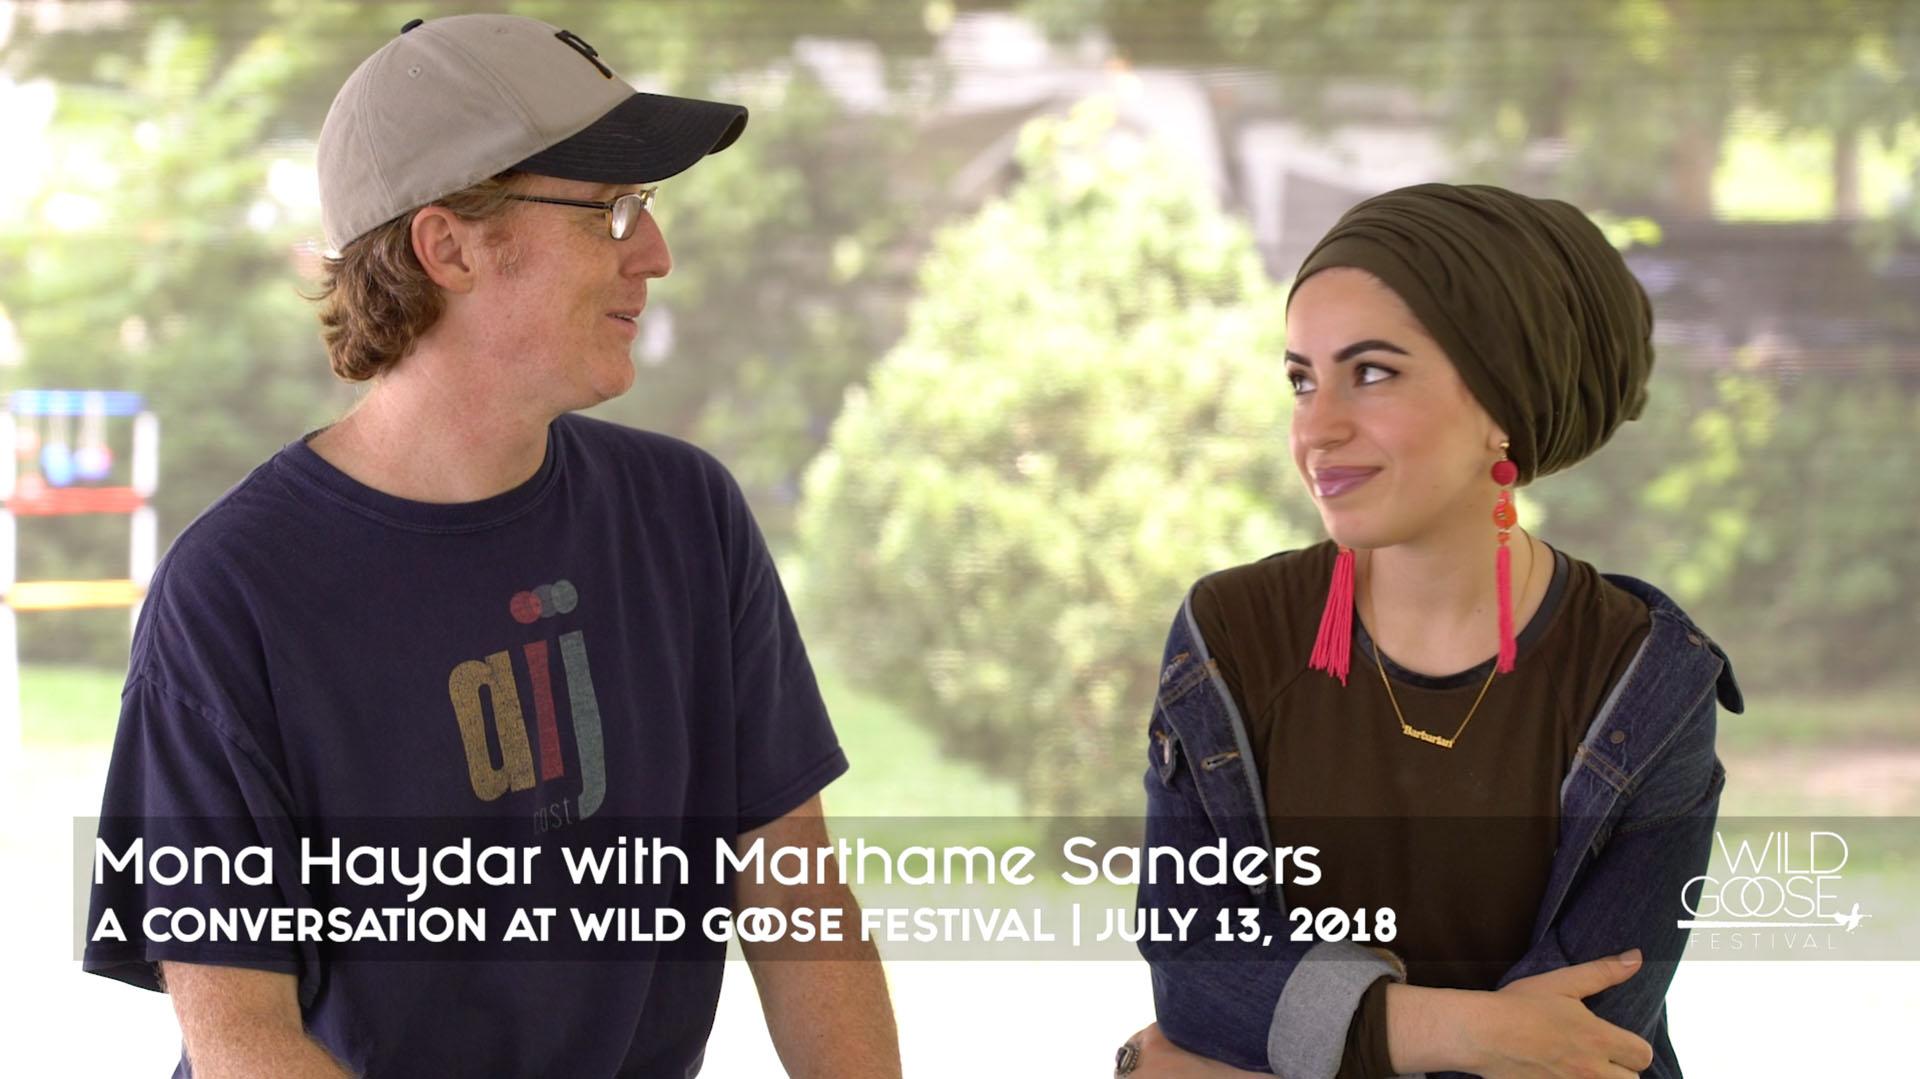 Mona Haydar Conversation with Marthame Sanders